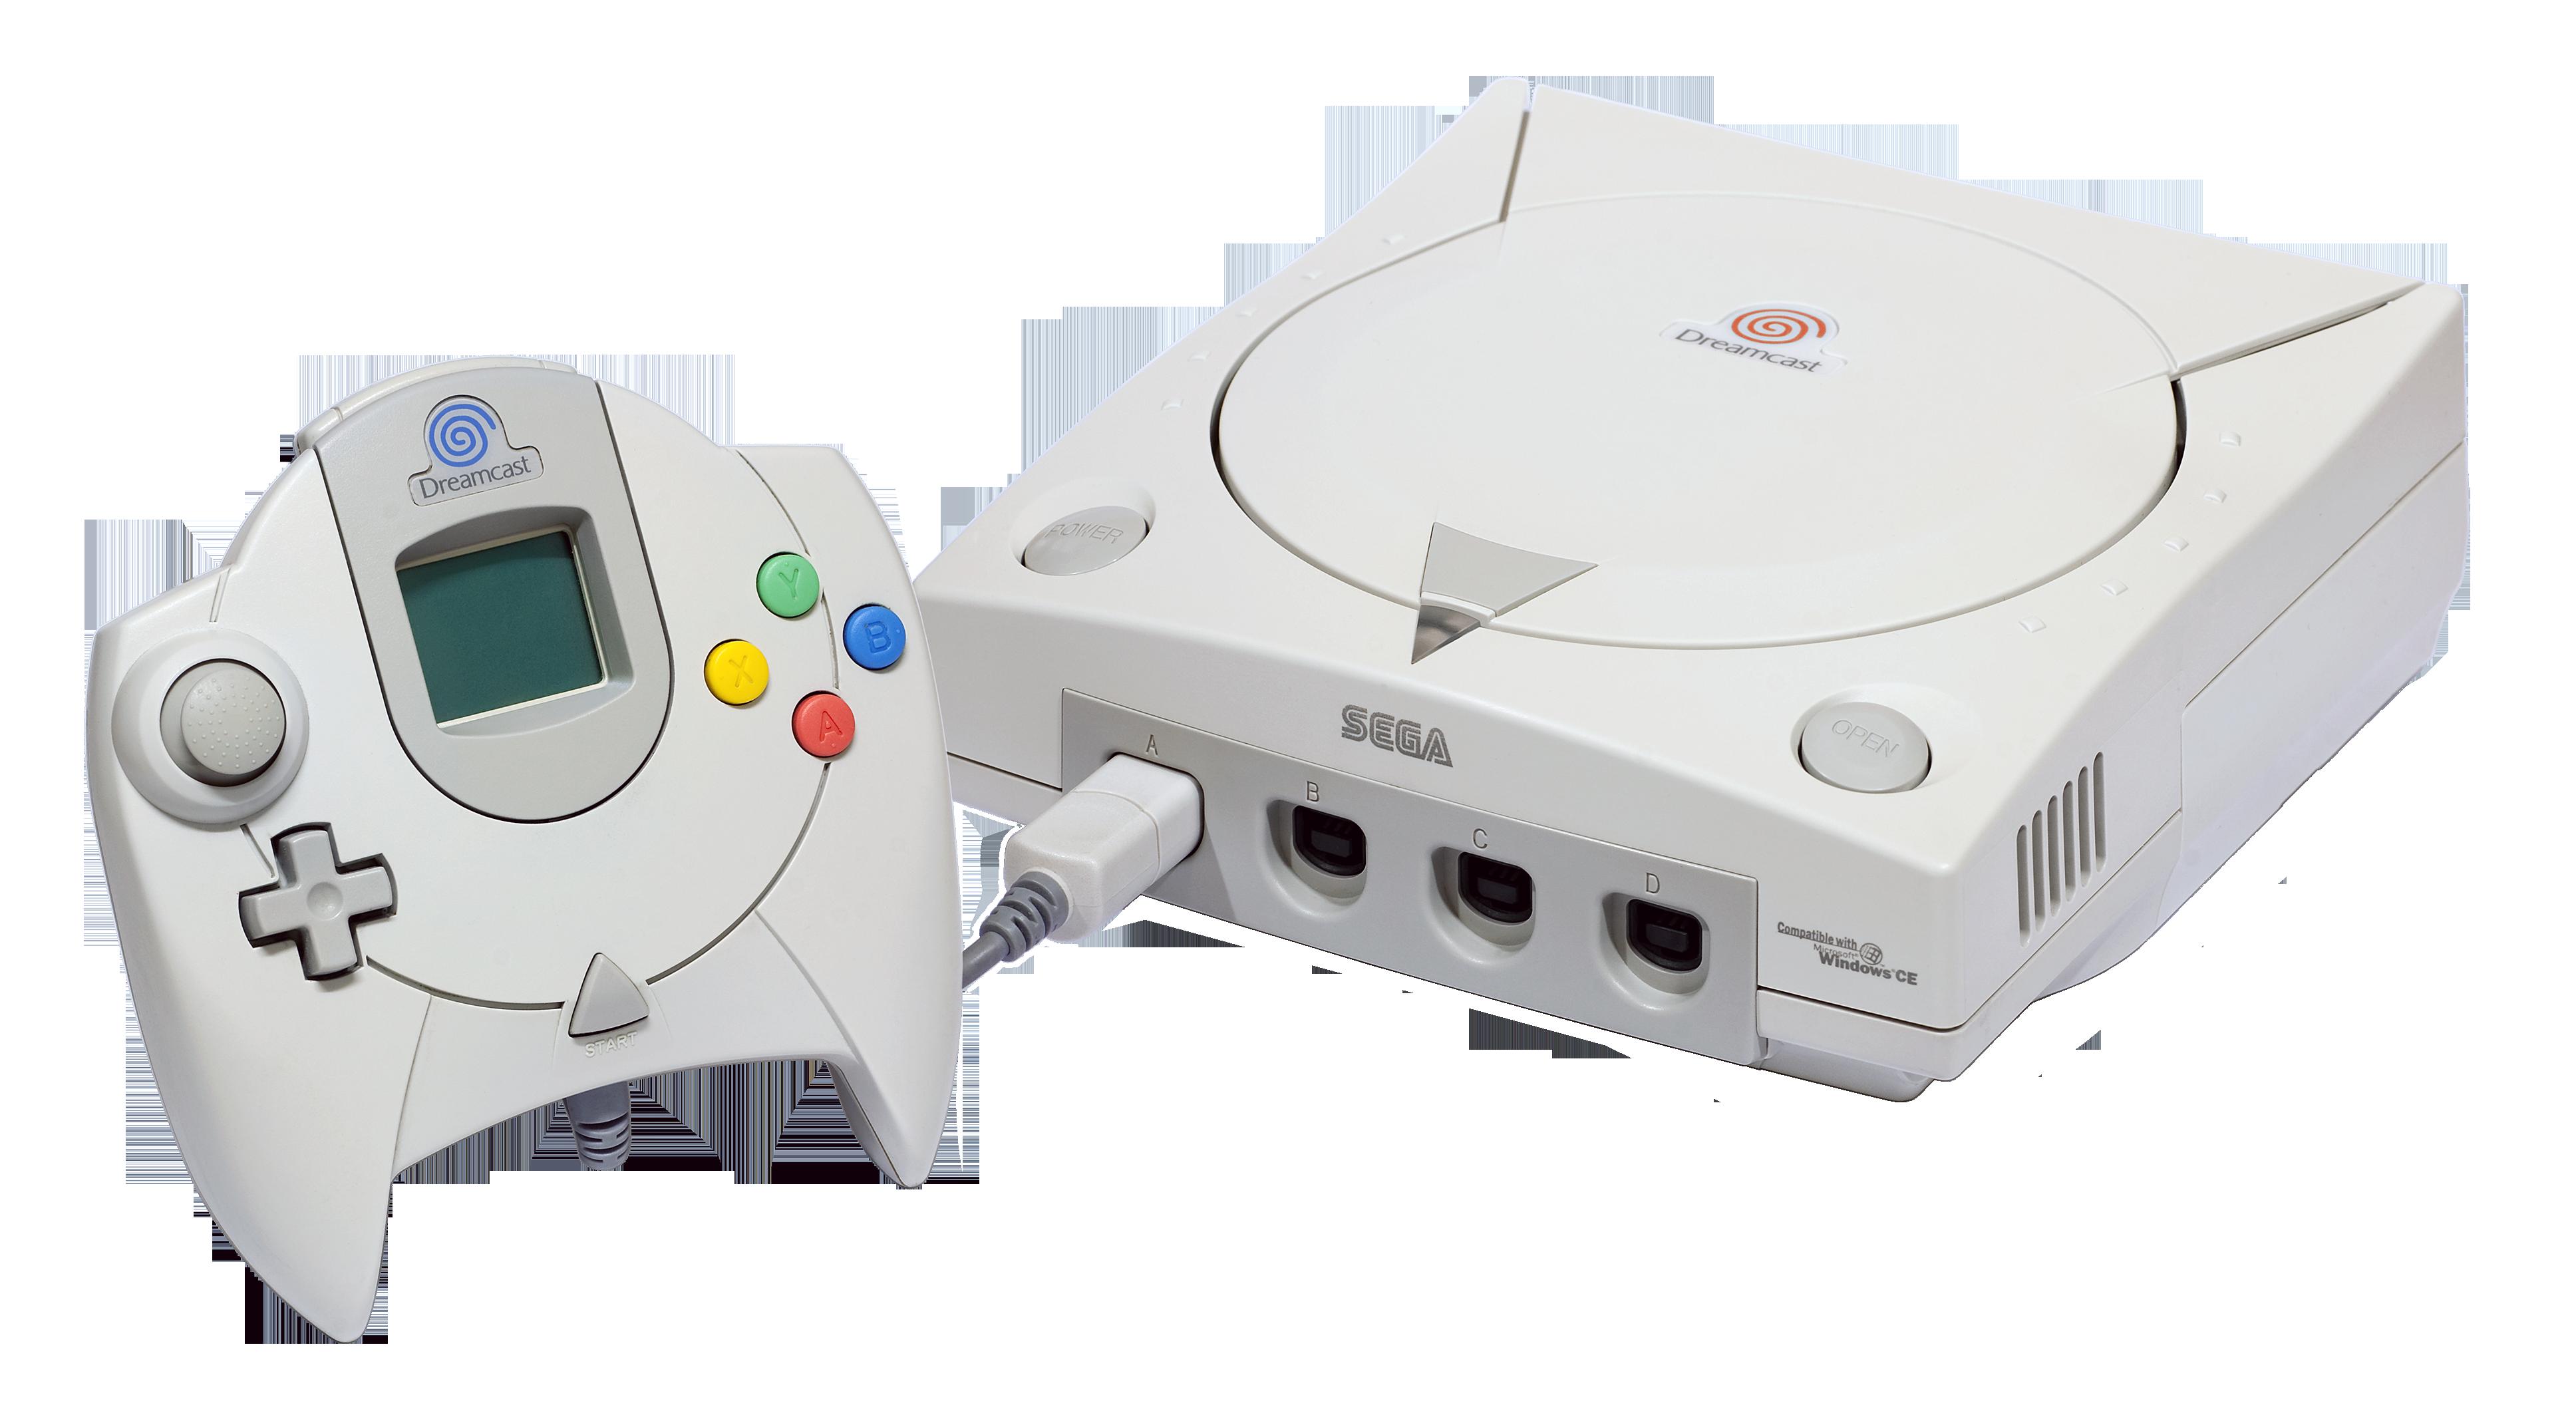 The ultimate Sega Dreamcast - Gareth Jones